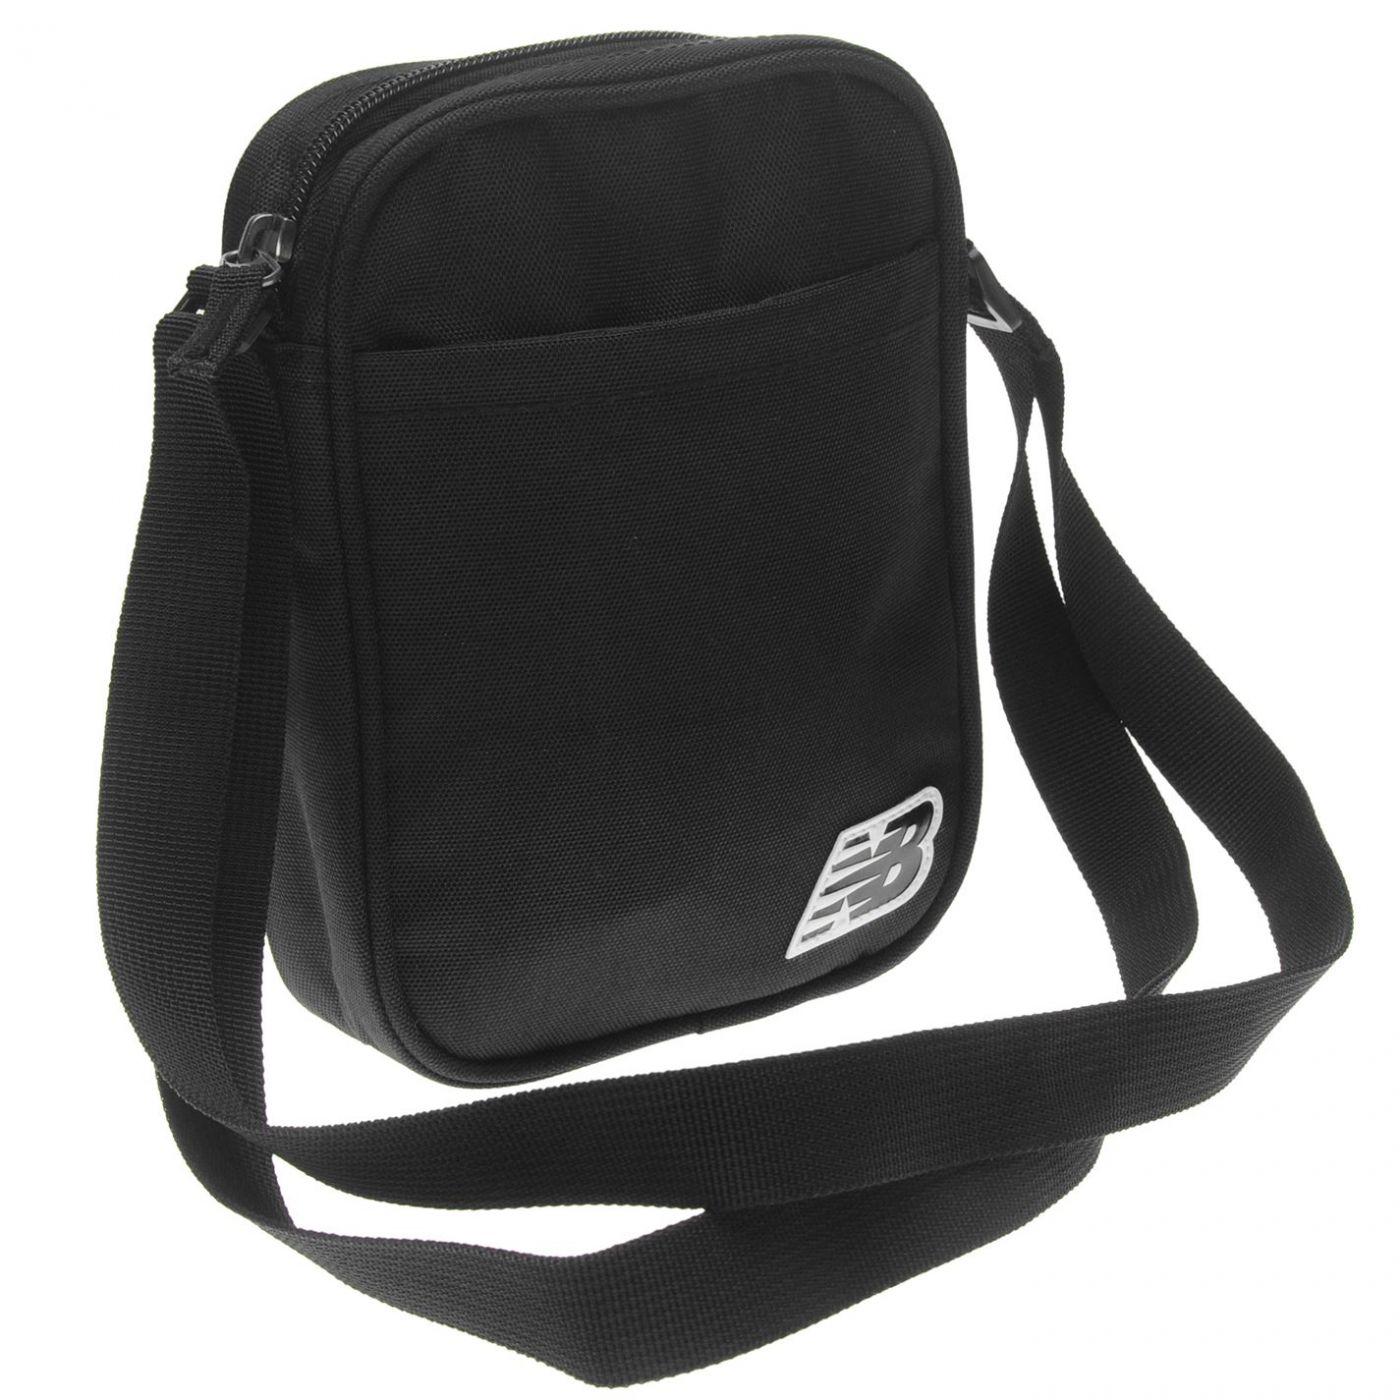 New Balance Pelham City Pouch Bag